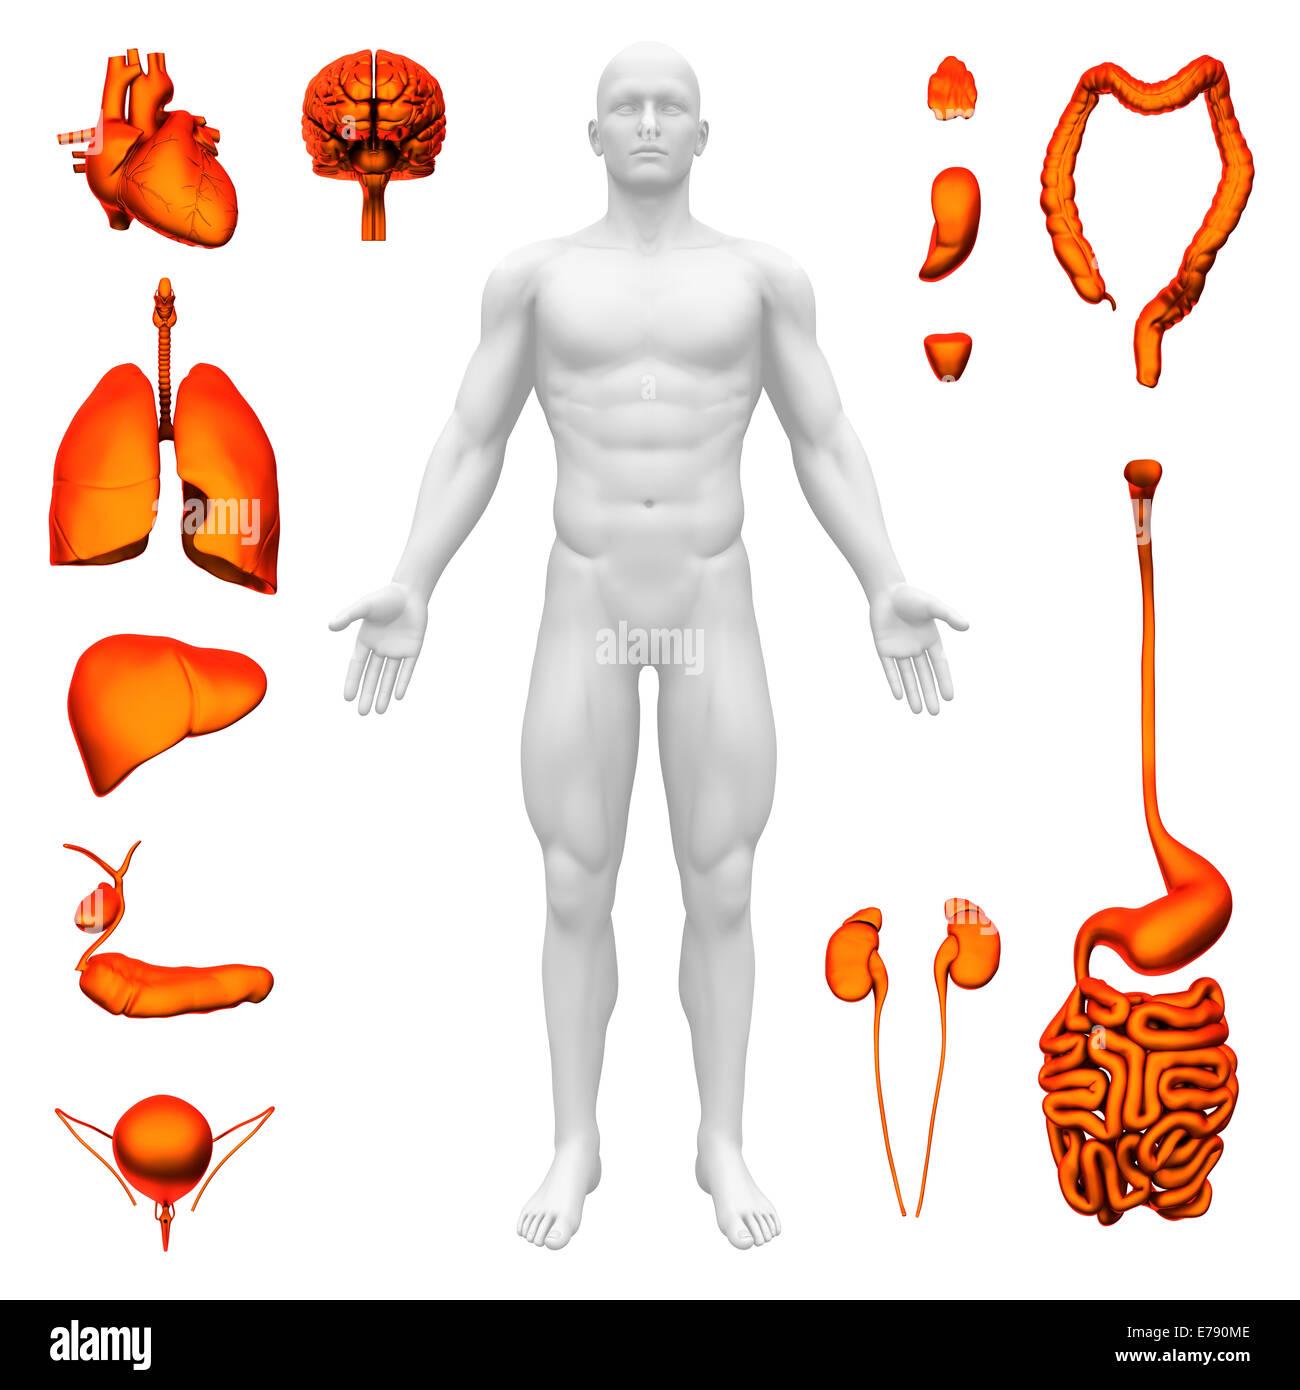 Internal organs - Human anatomy - Stock Image